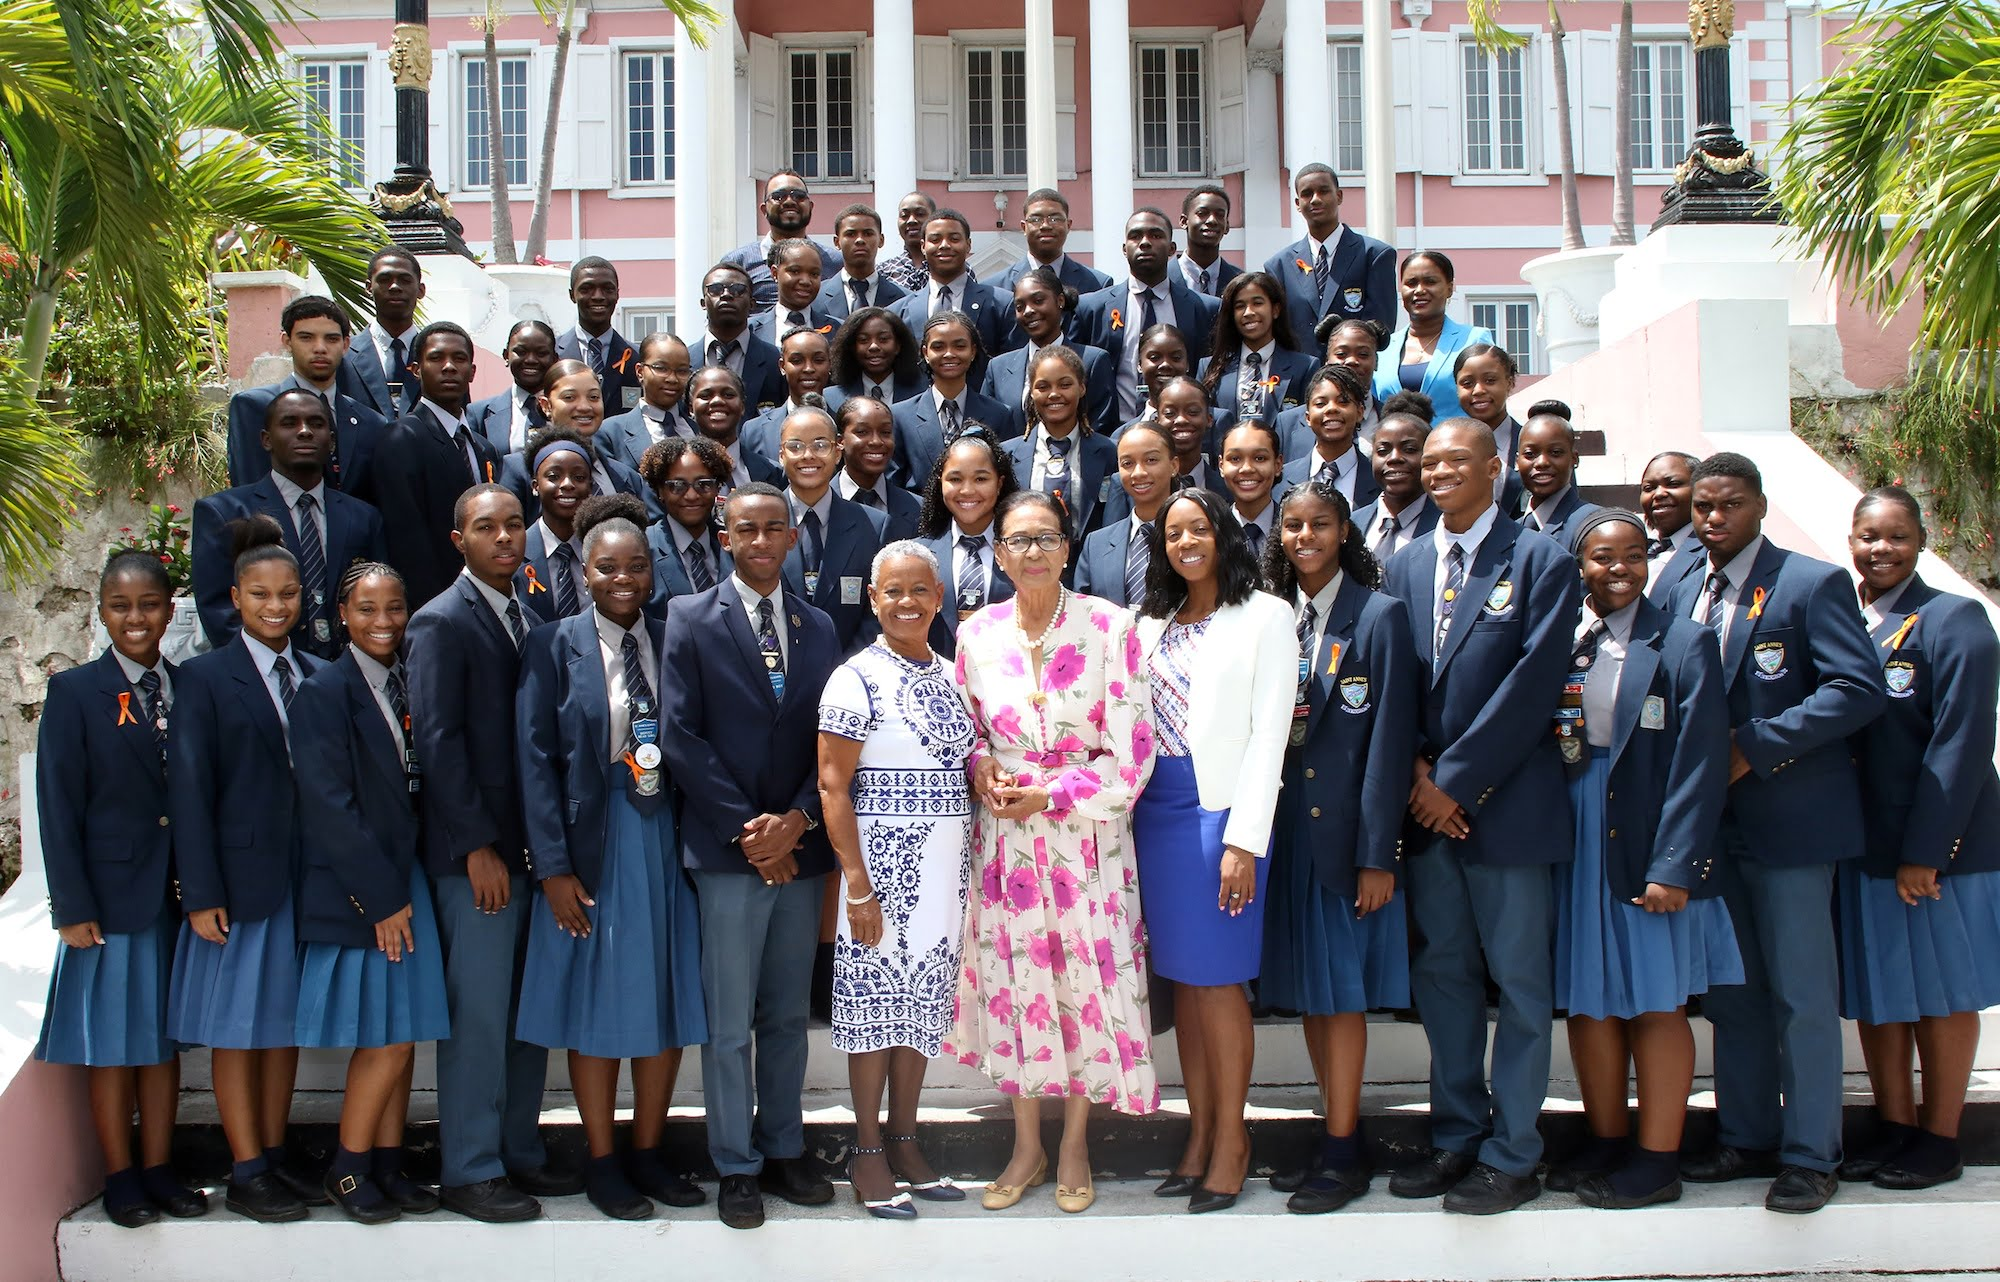 GG welcomes St. Anne's School 2019 graduating class